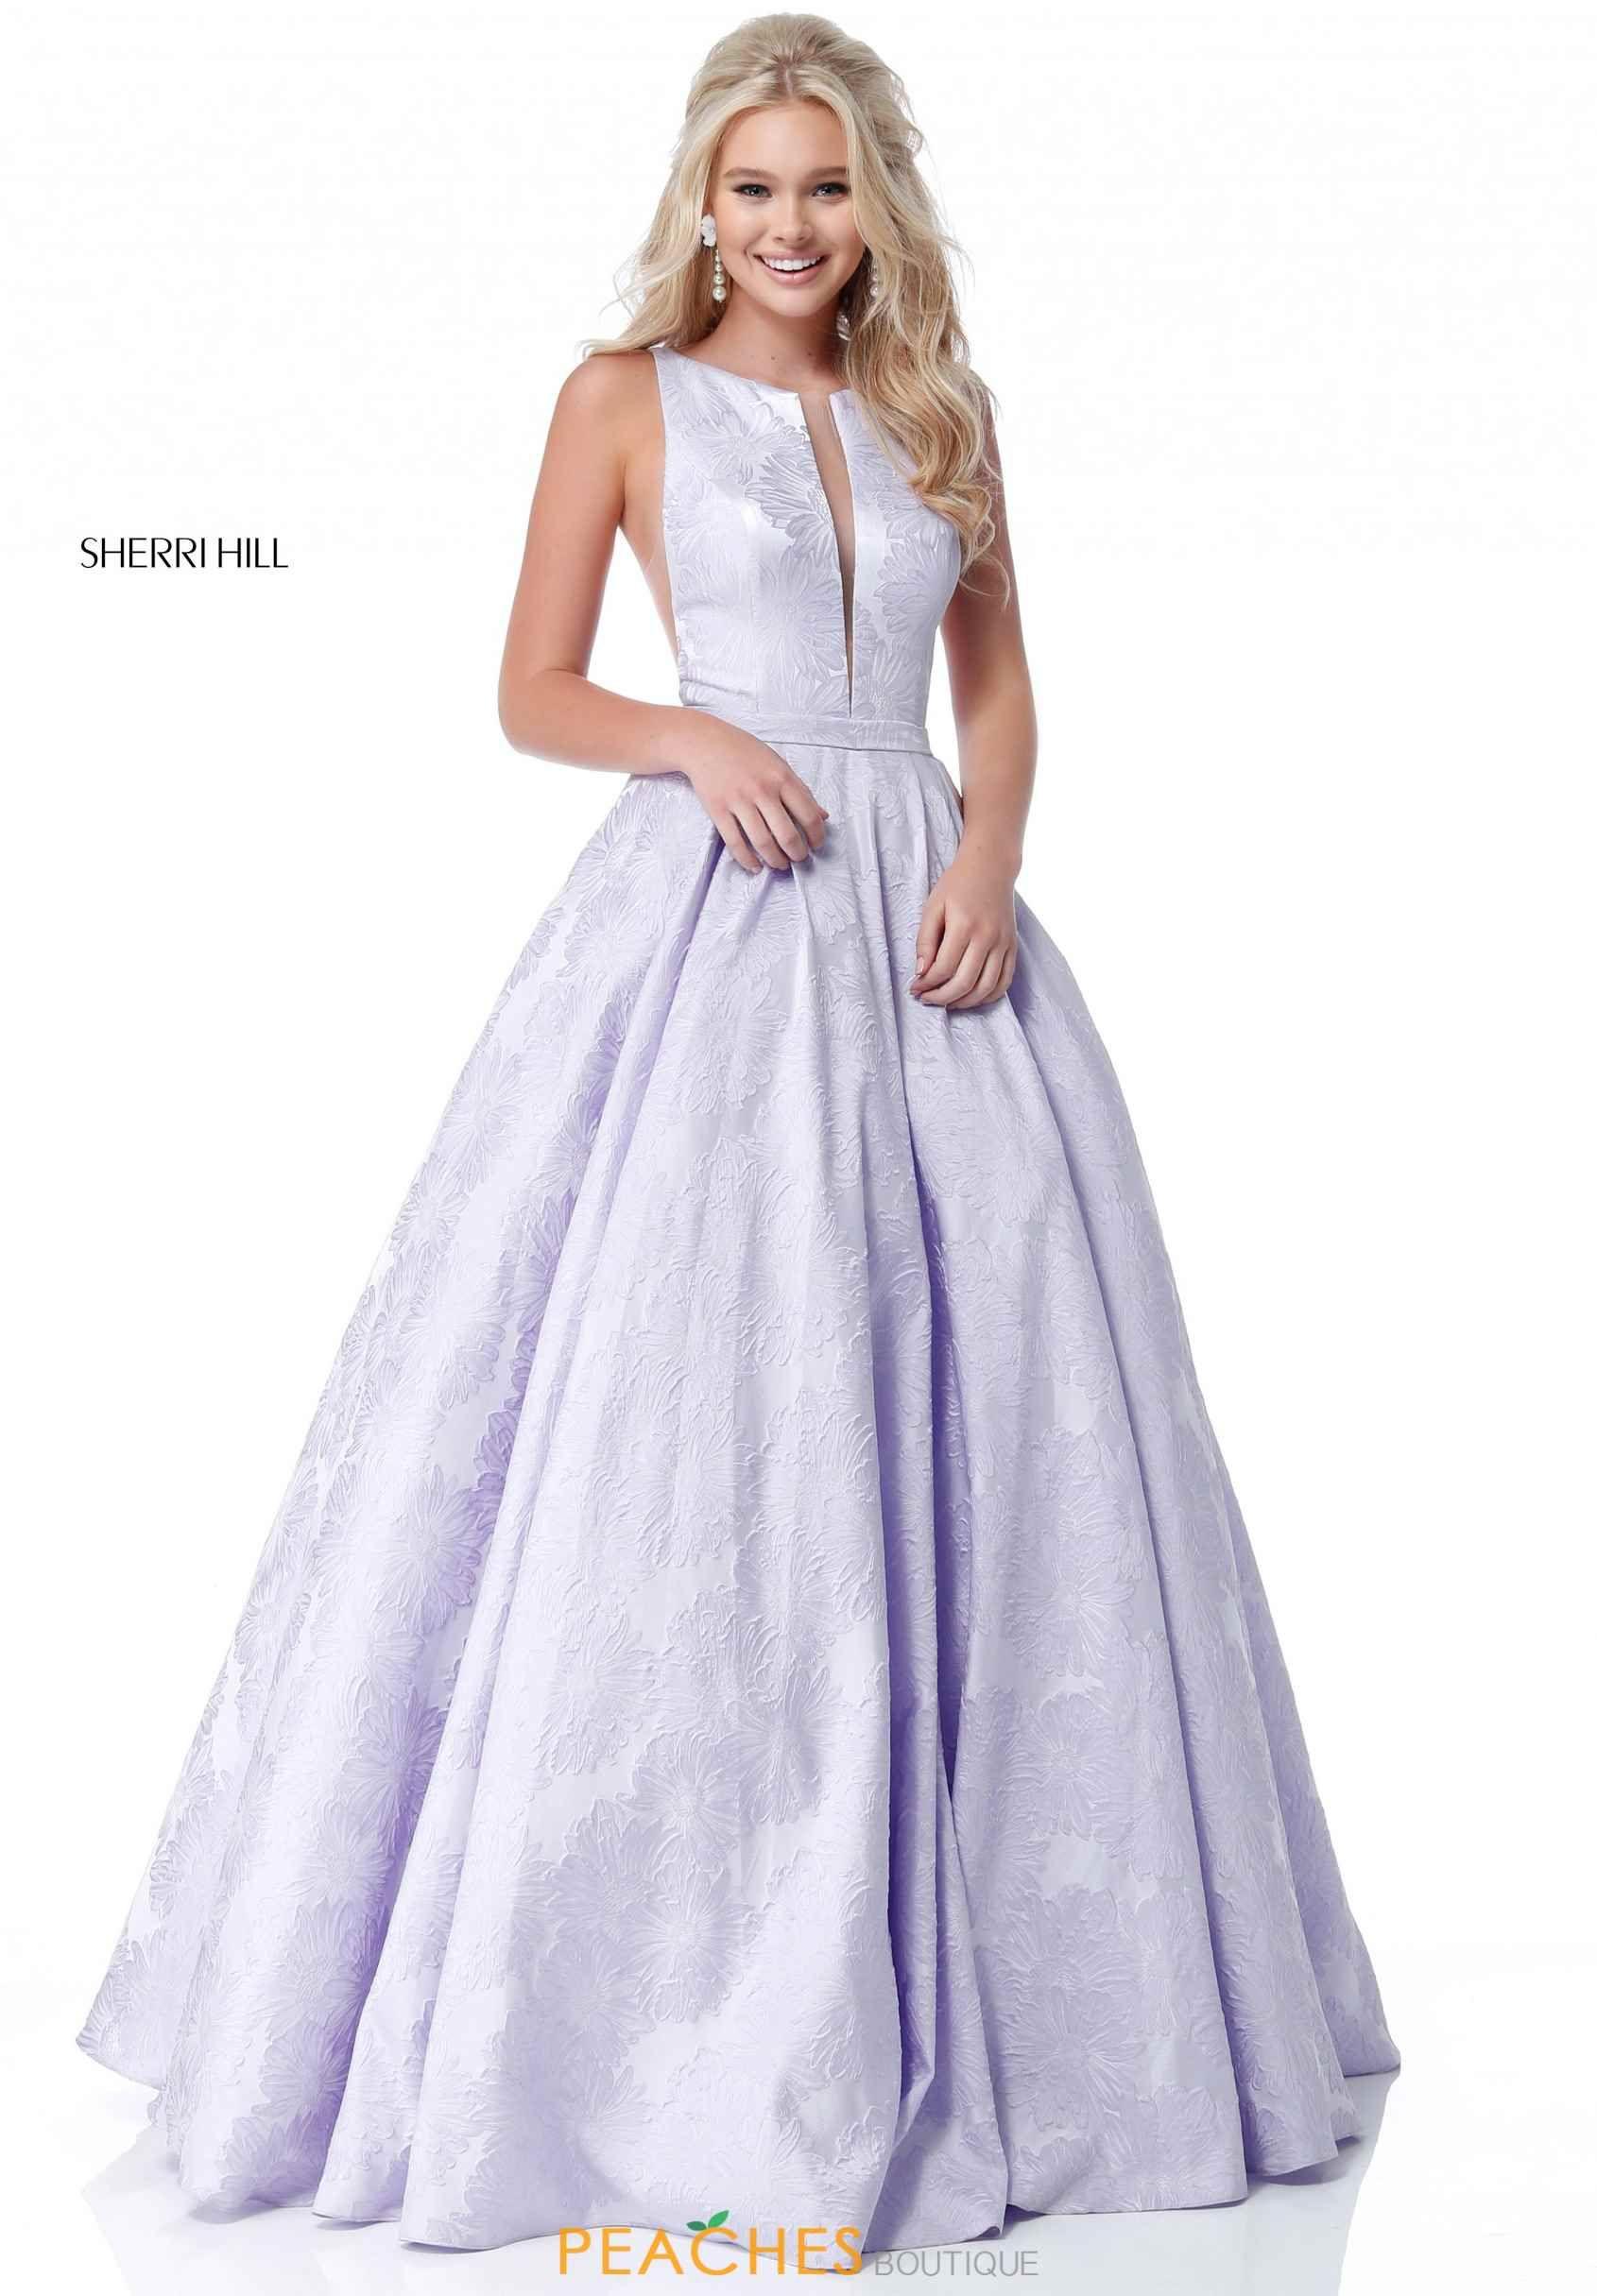 Sherri hill high neckline long dress prom dresses